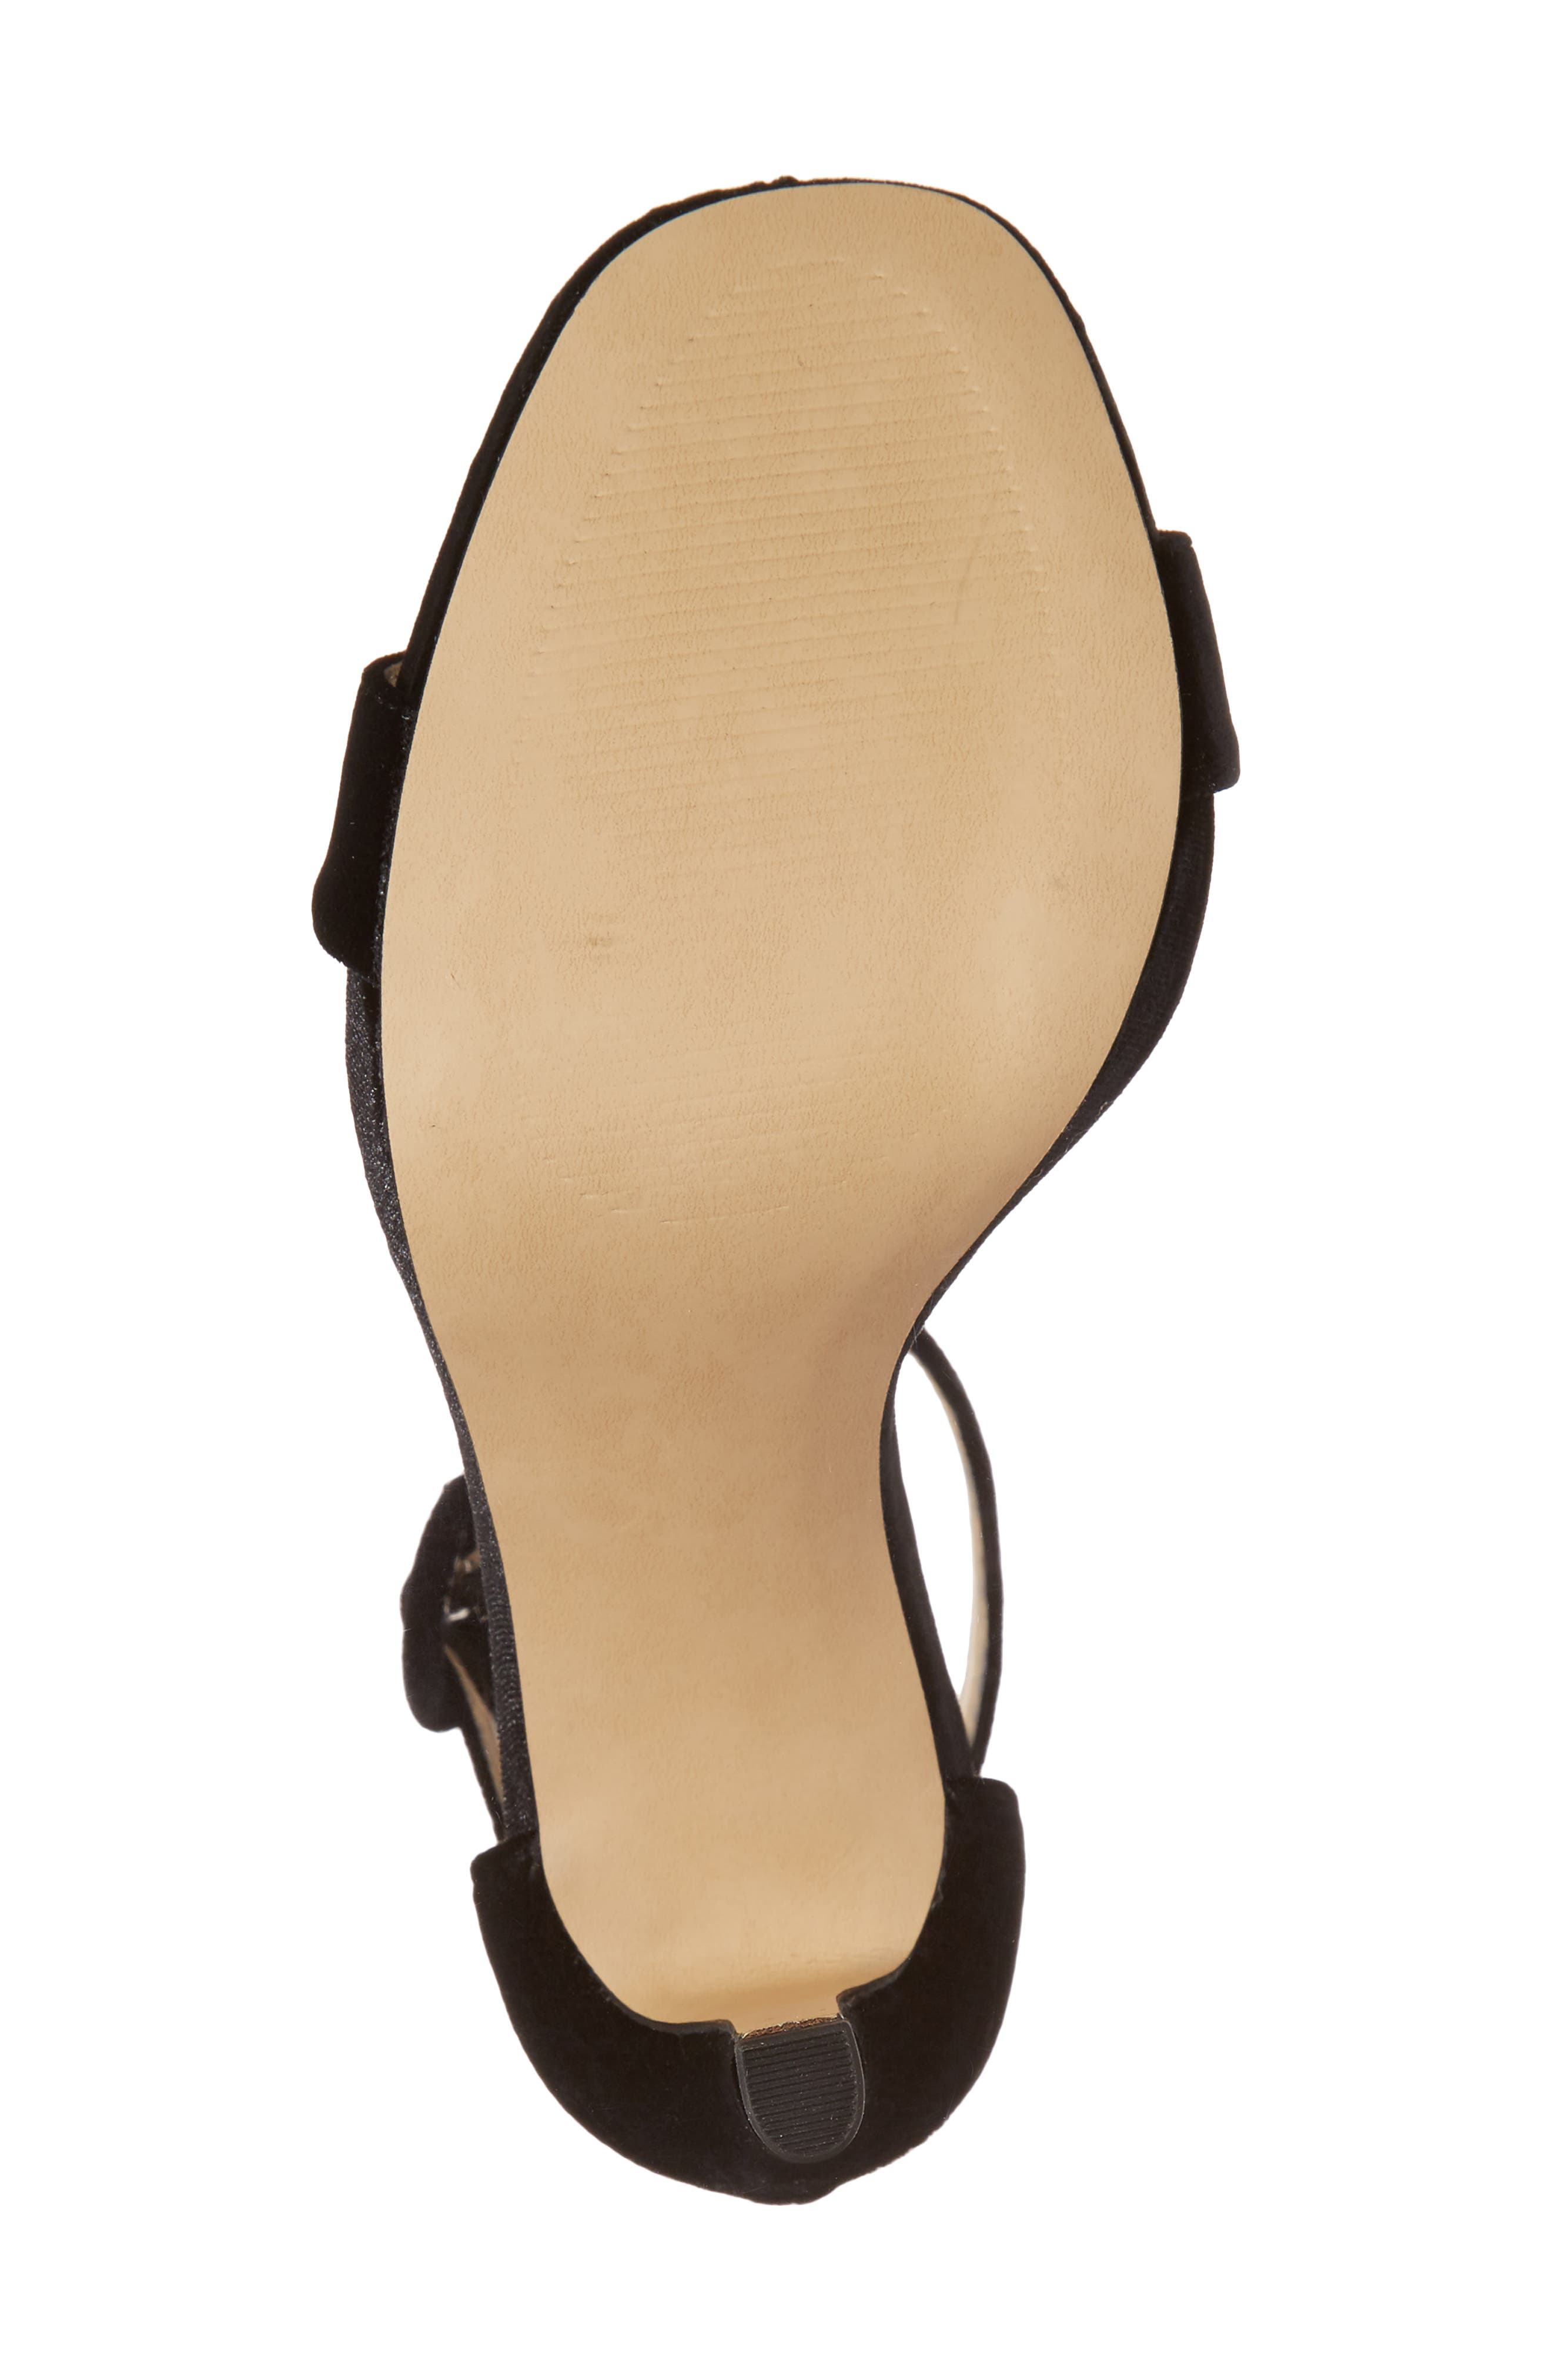 Emelia Ankle Strap Sandal,                             Alternate thumbnail 6, color,                             001